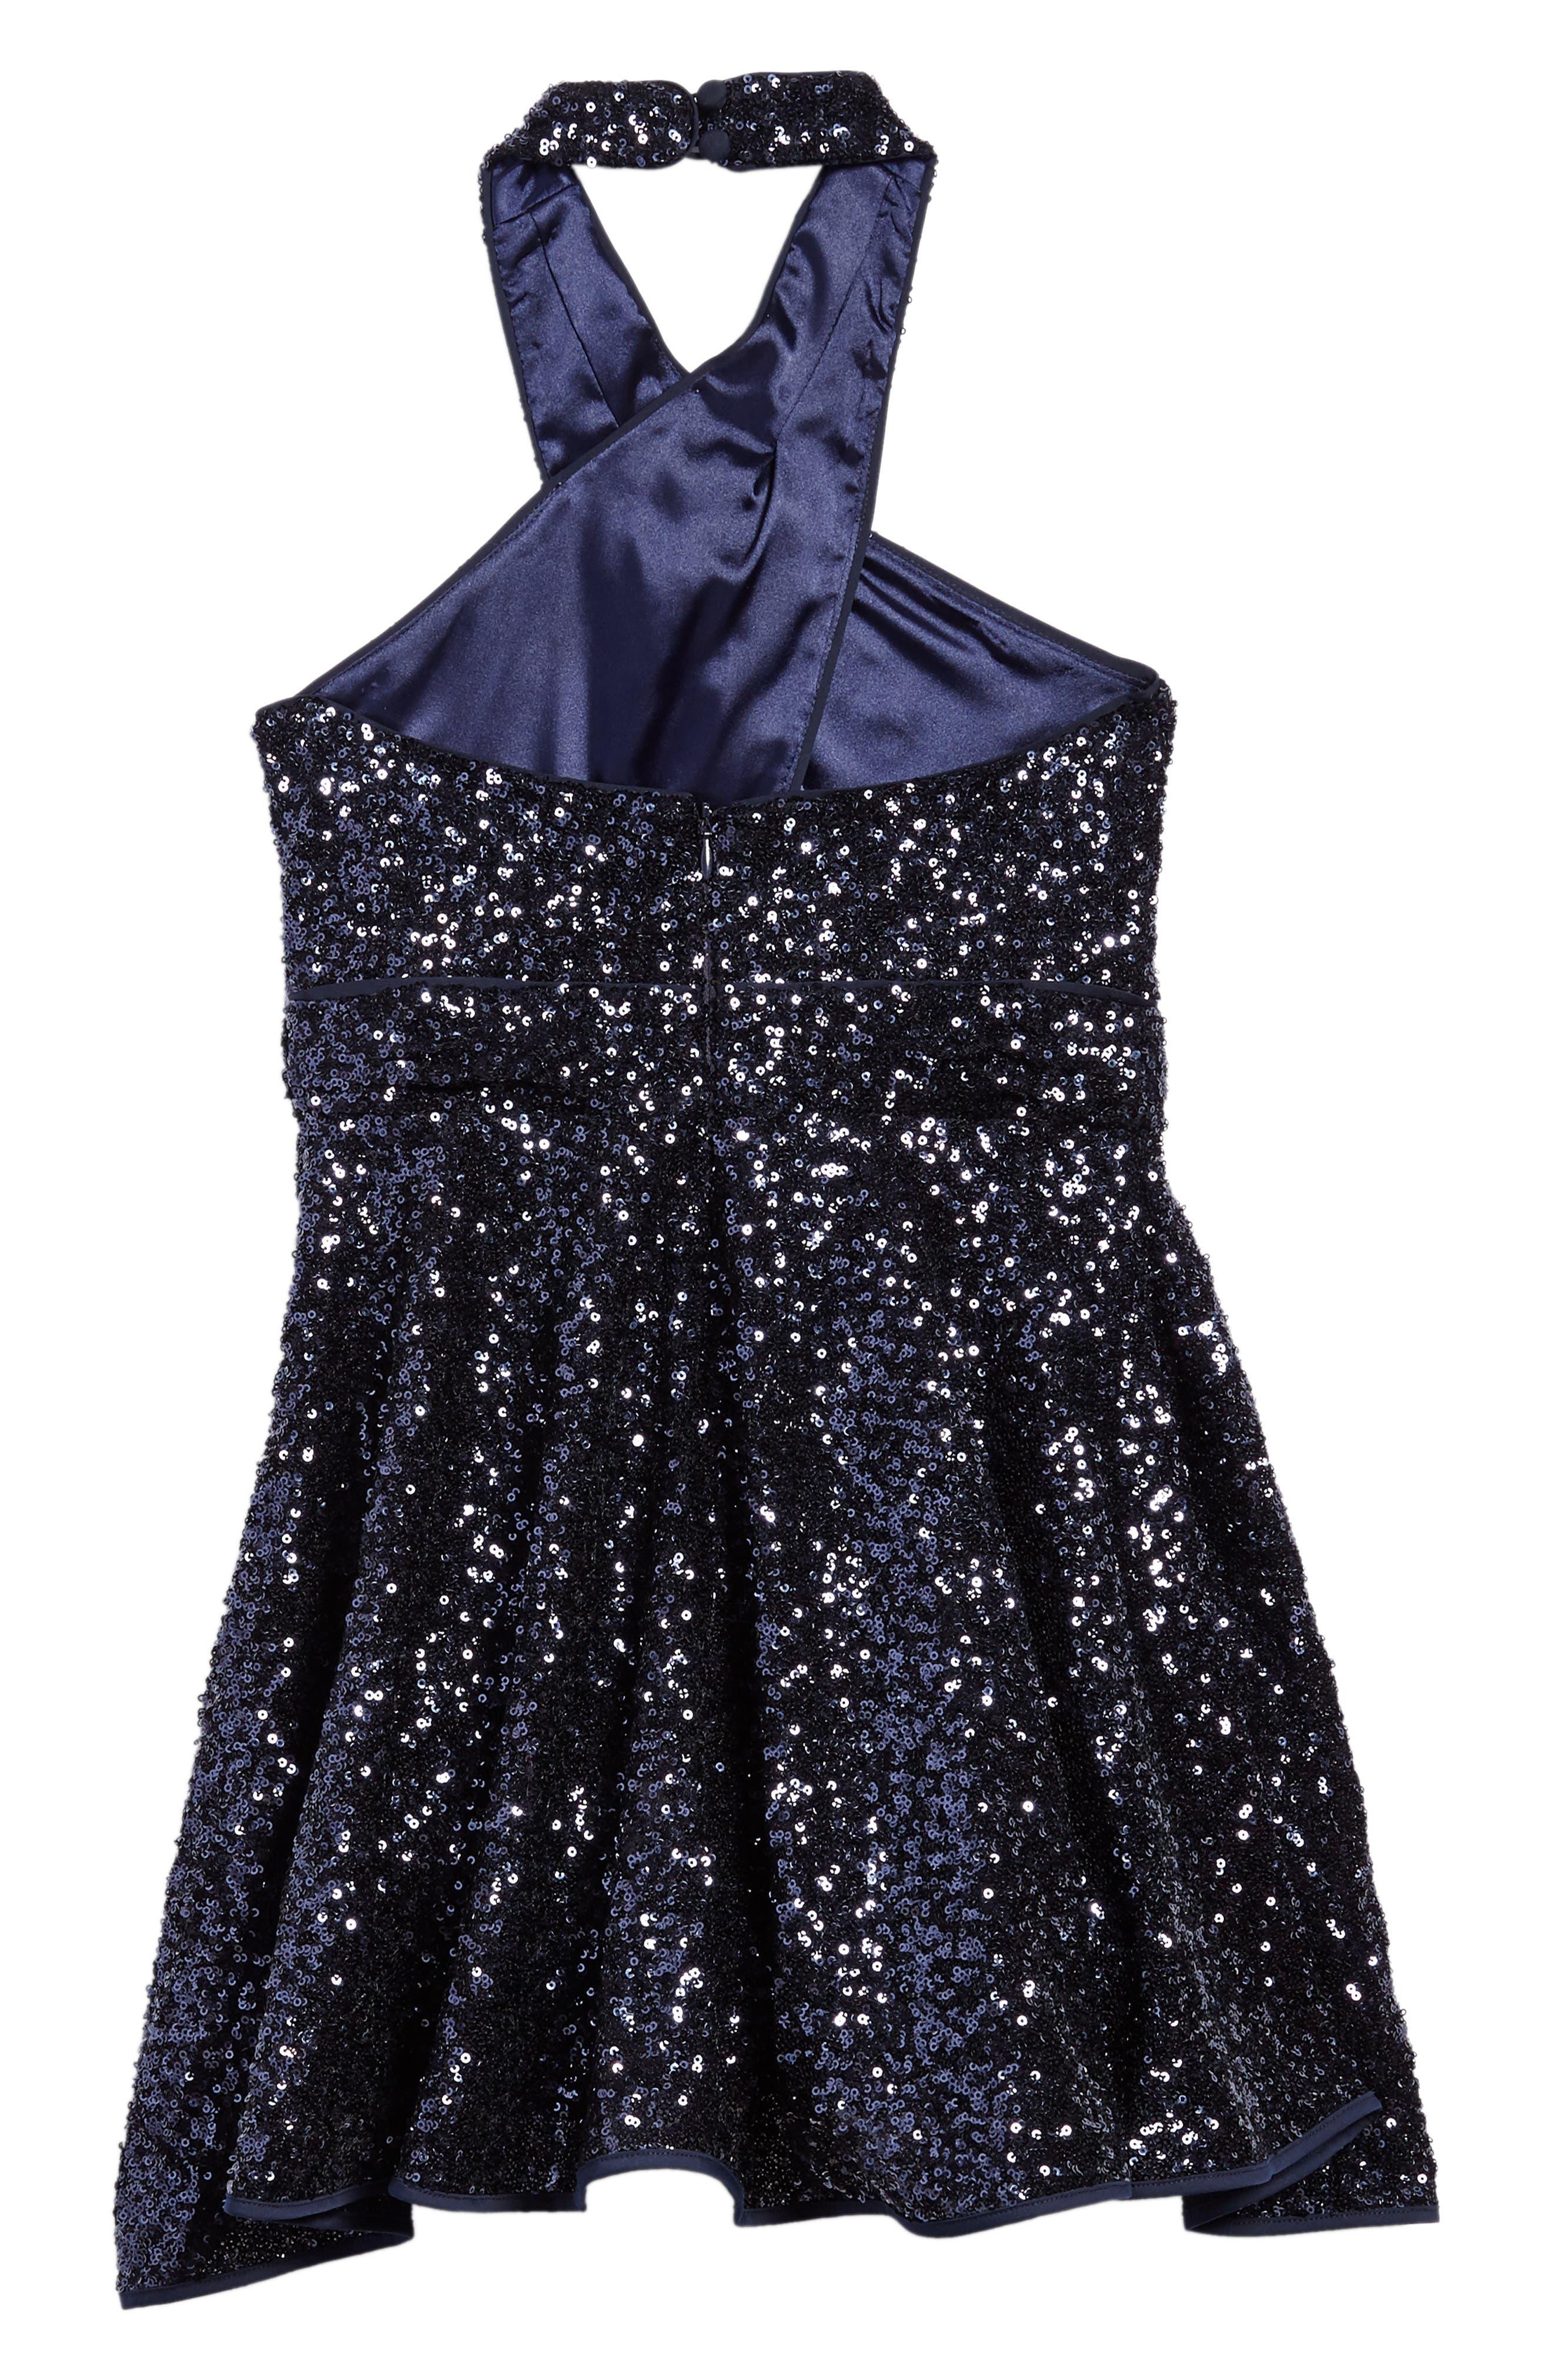 Sydney Sequin Halter Dress,                             Alternate thumbnail 2, color,                             410